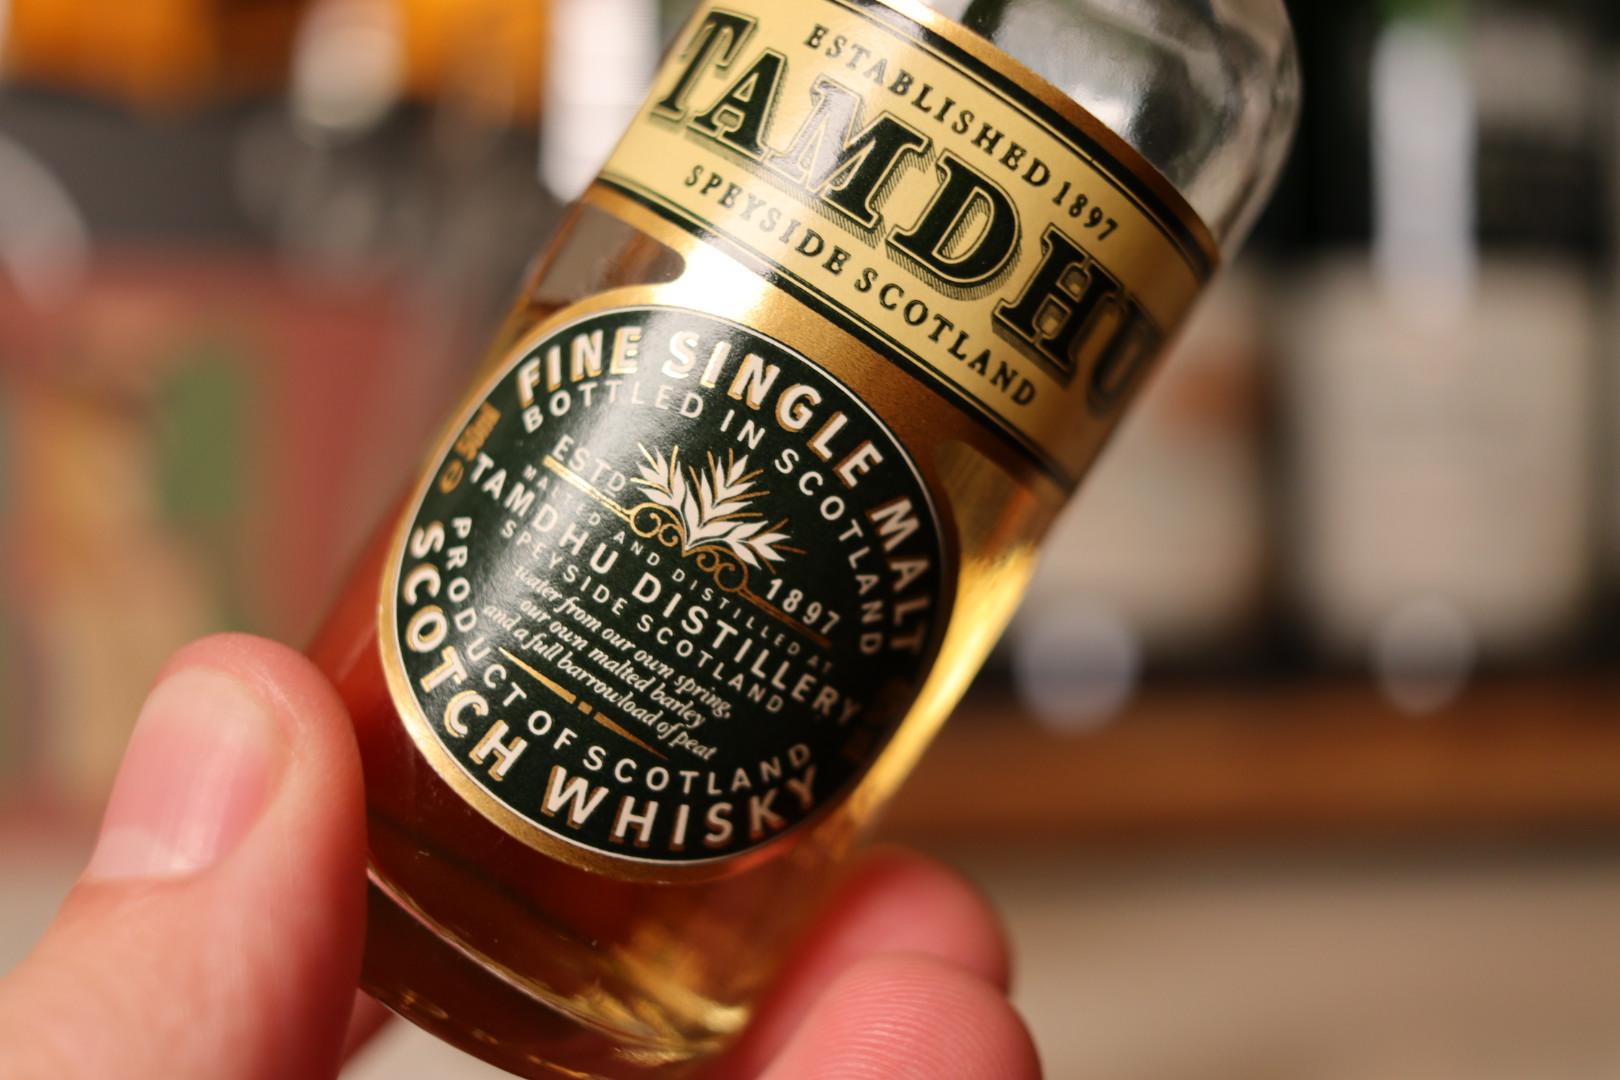 Whiskybesprechung #200: Tamdhu Fine Single Malt (ca. 2005)